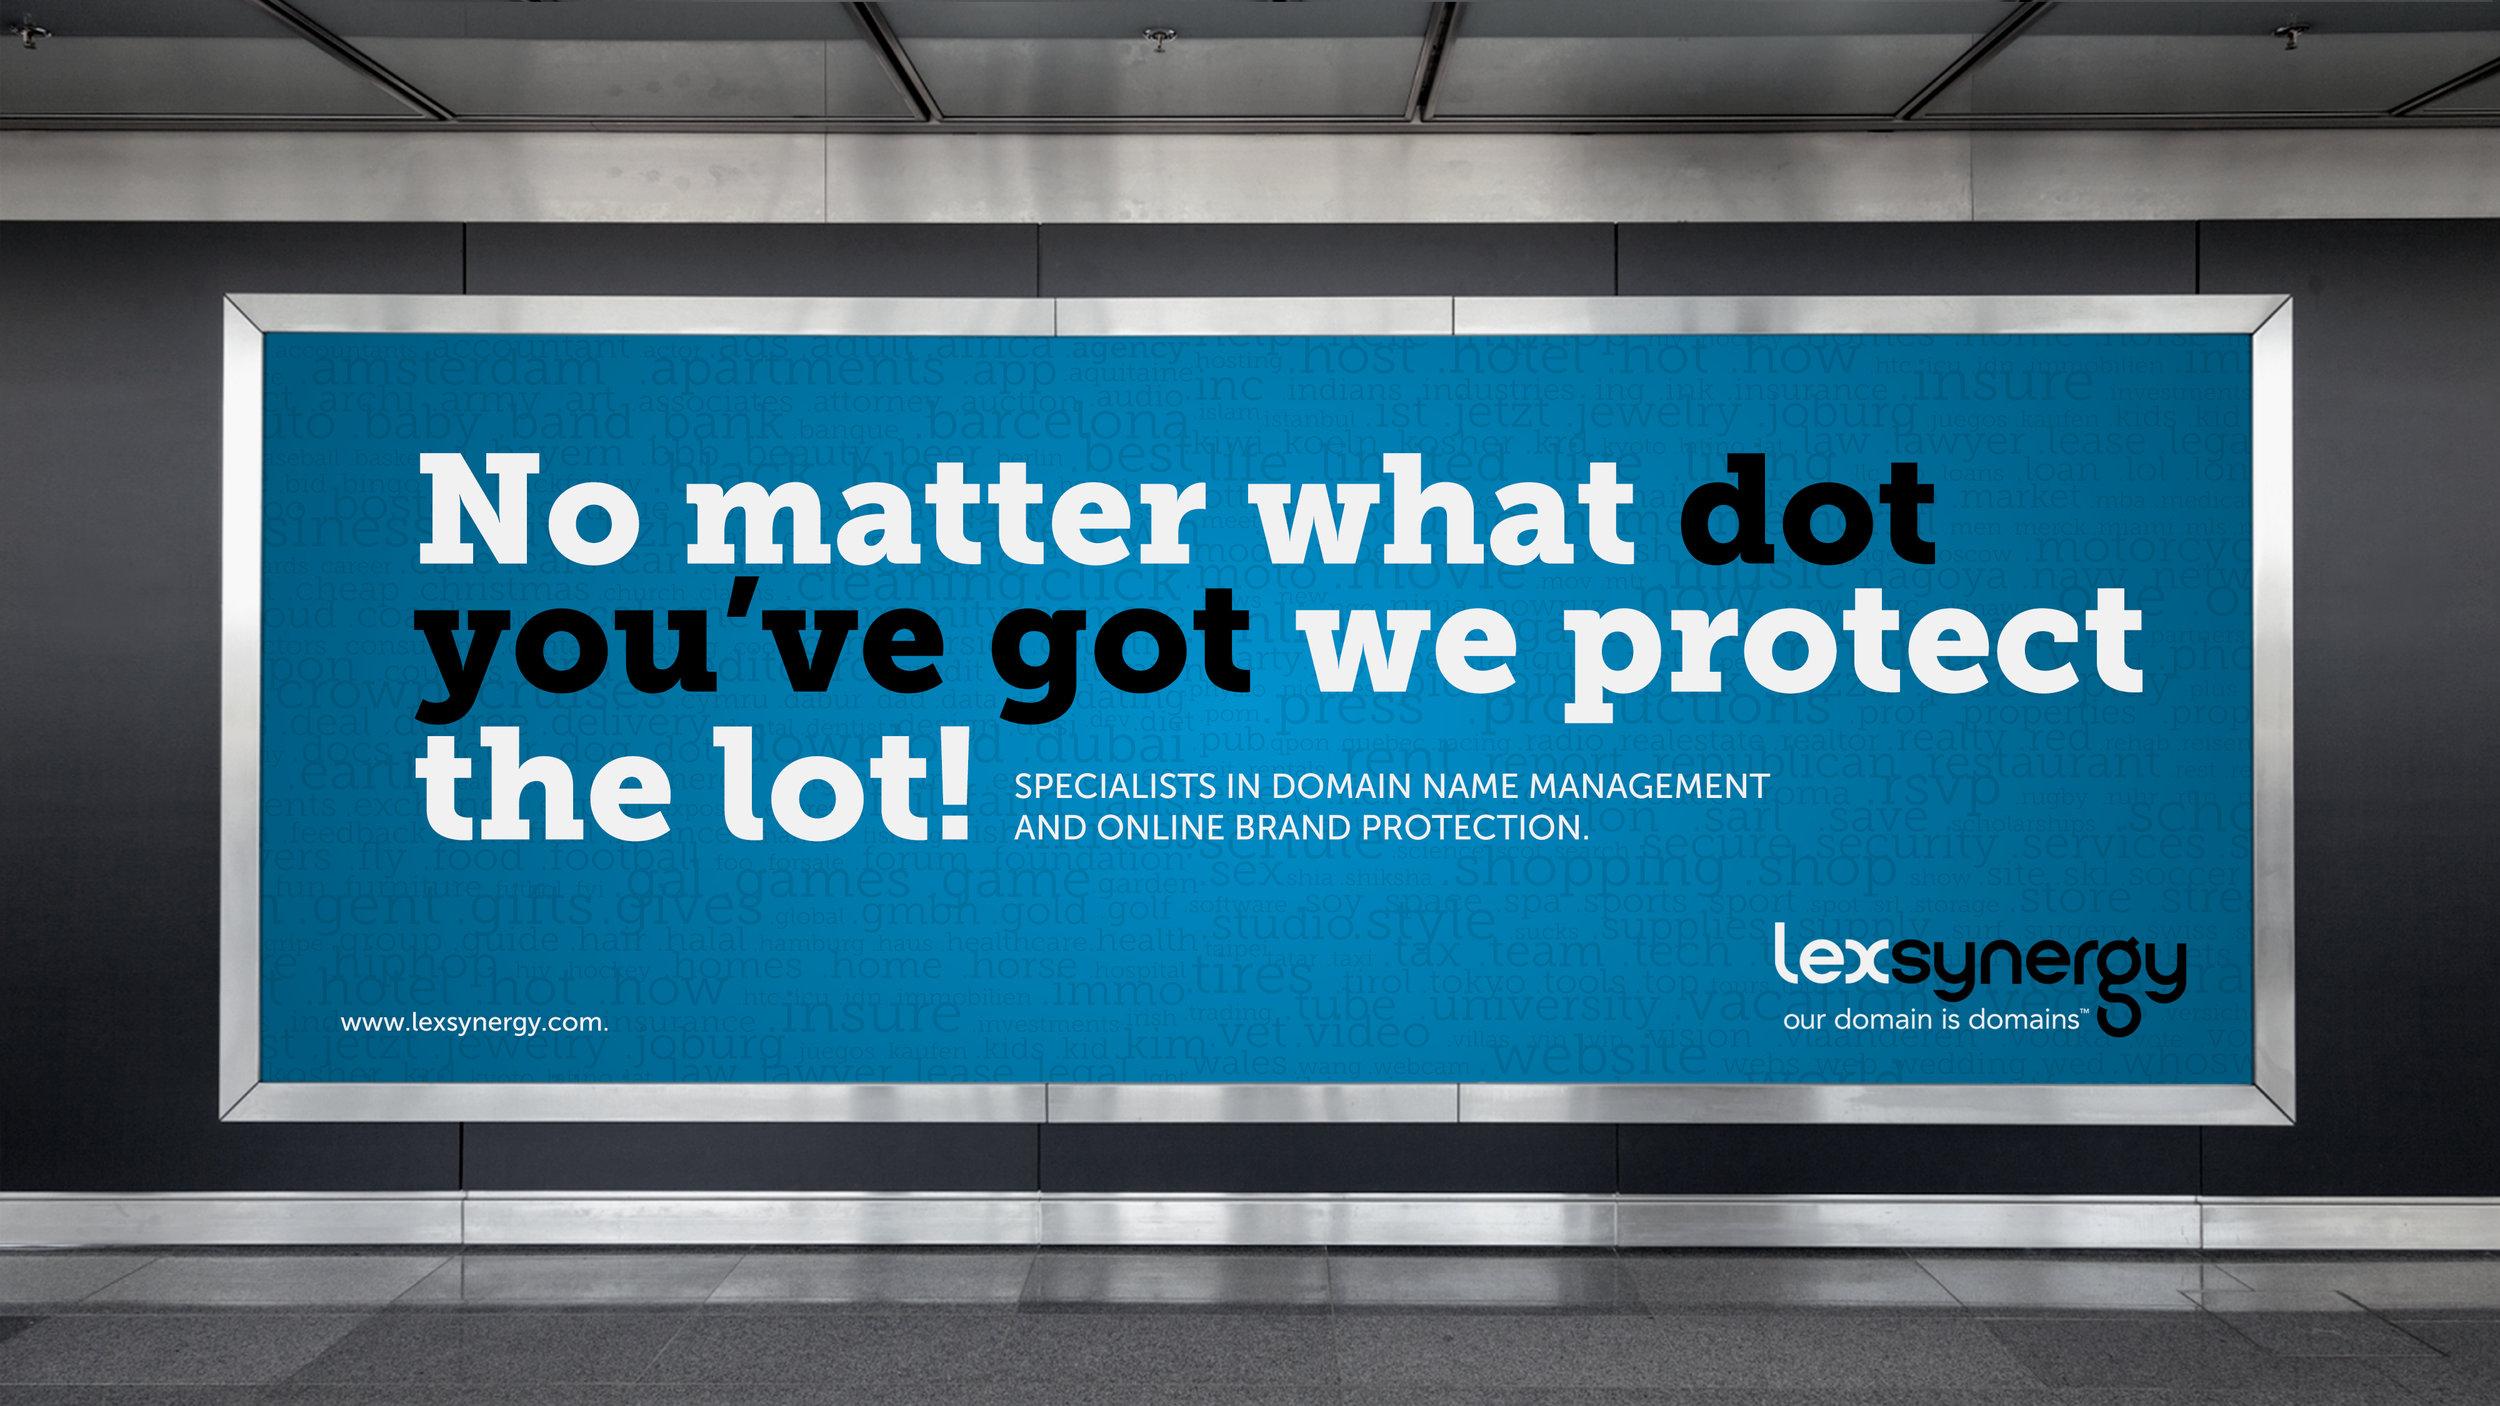 Brand_republica_billboard_lexsynergy.jpg